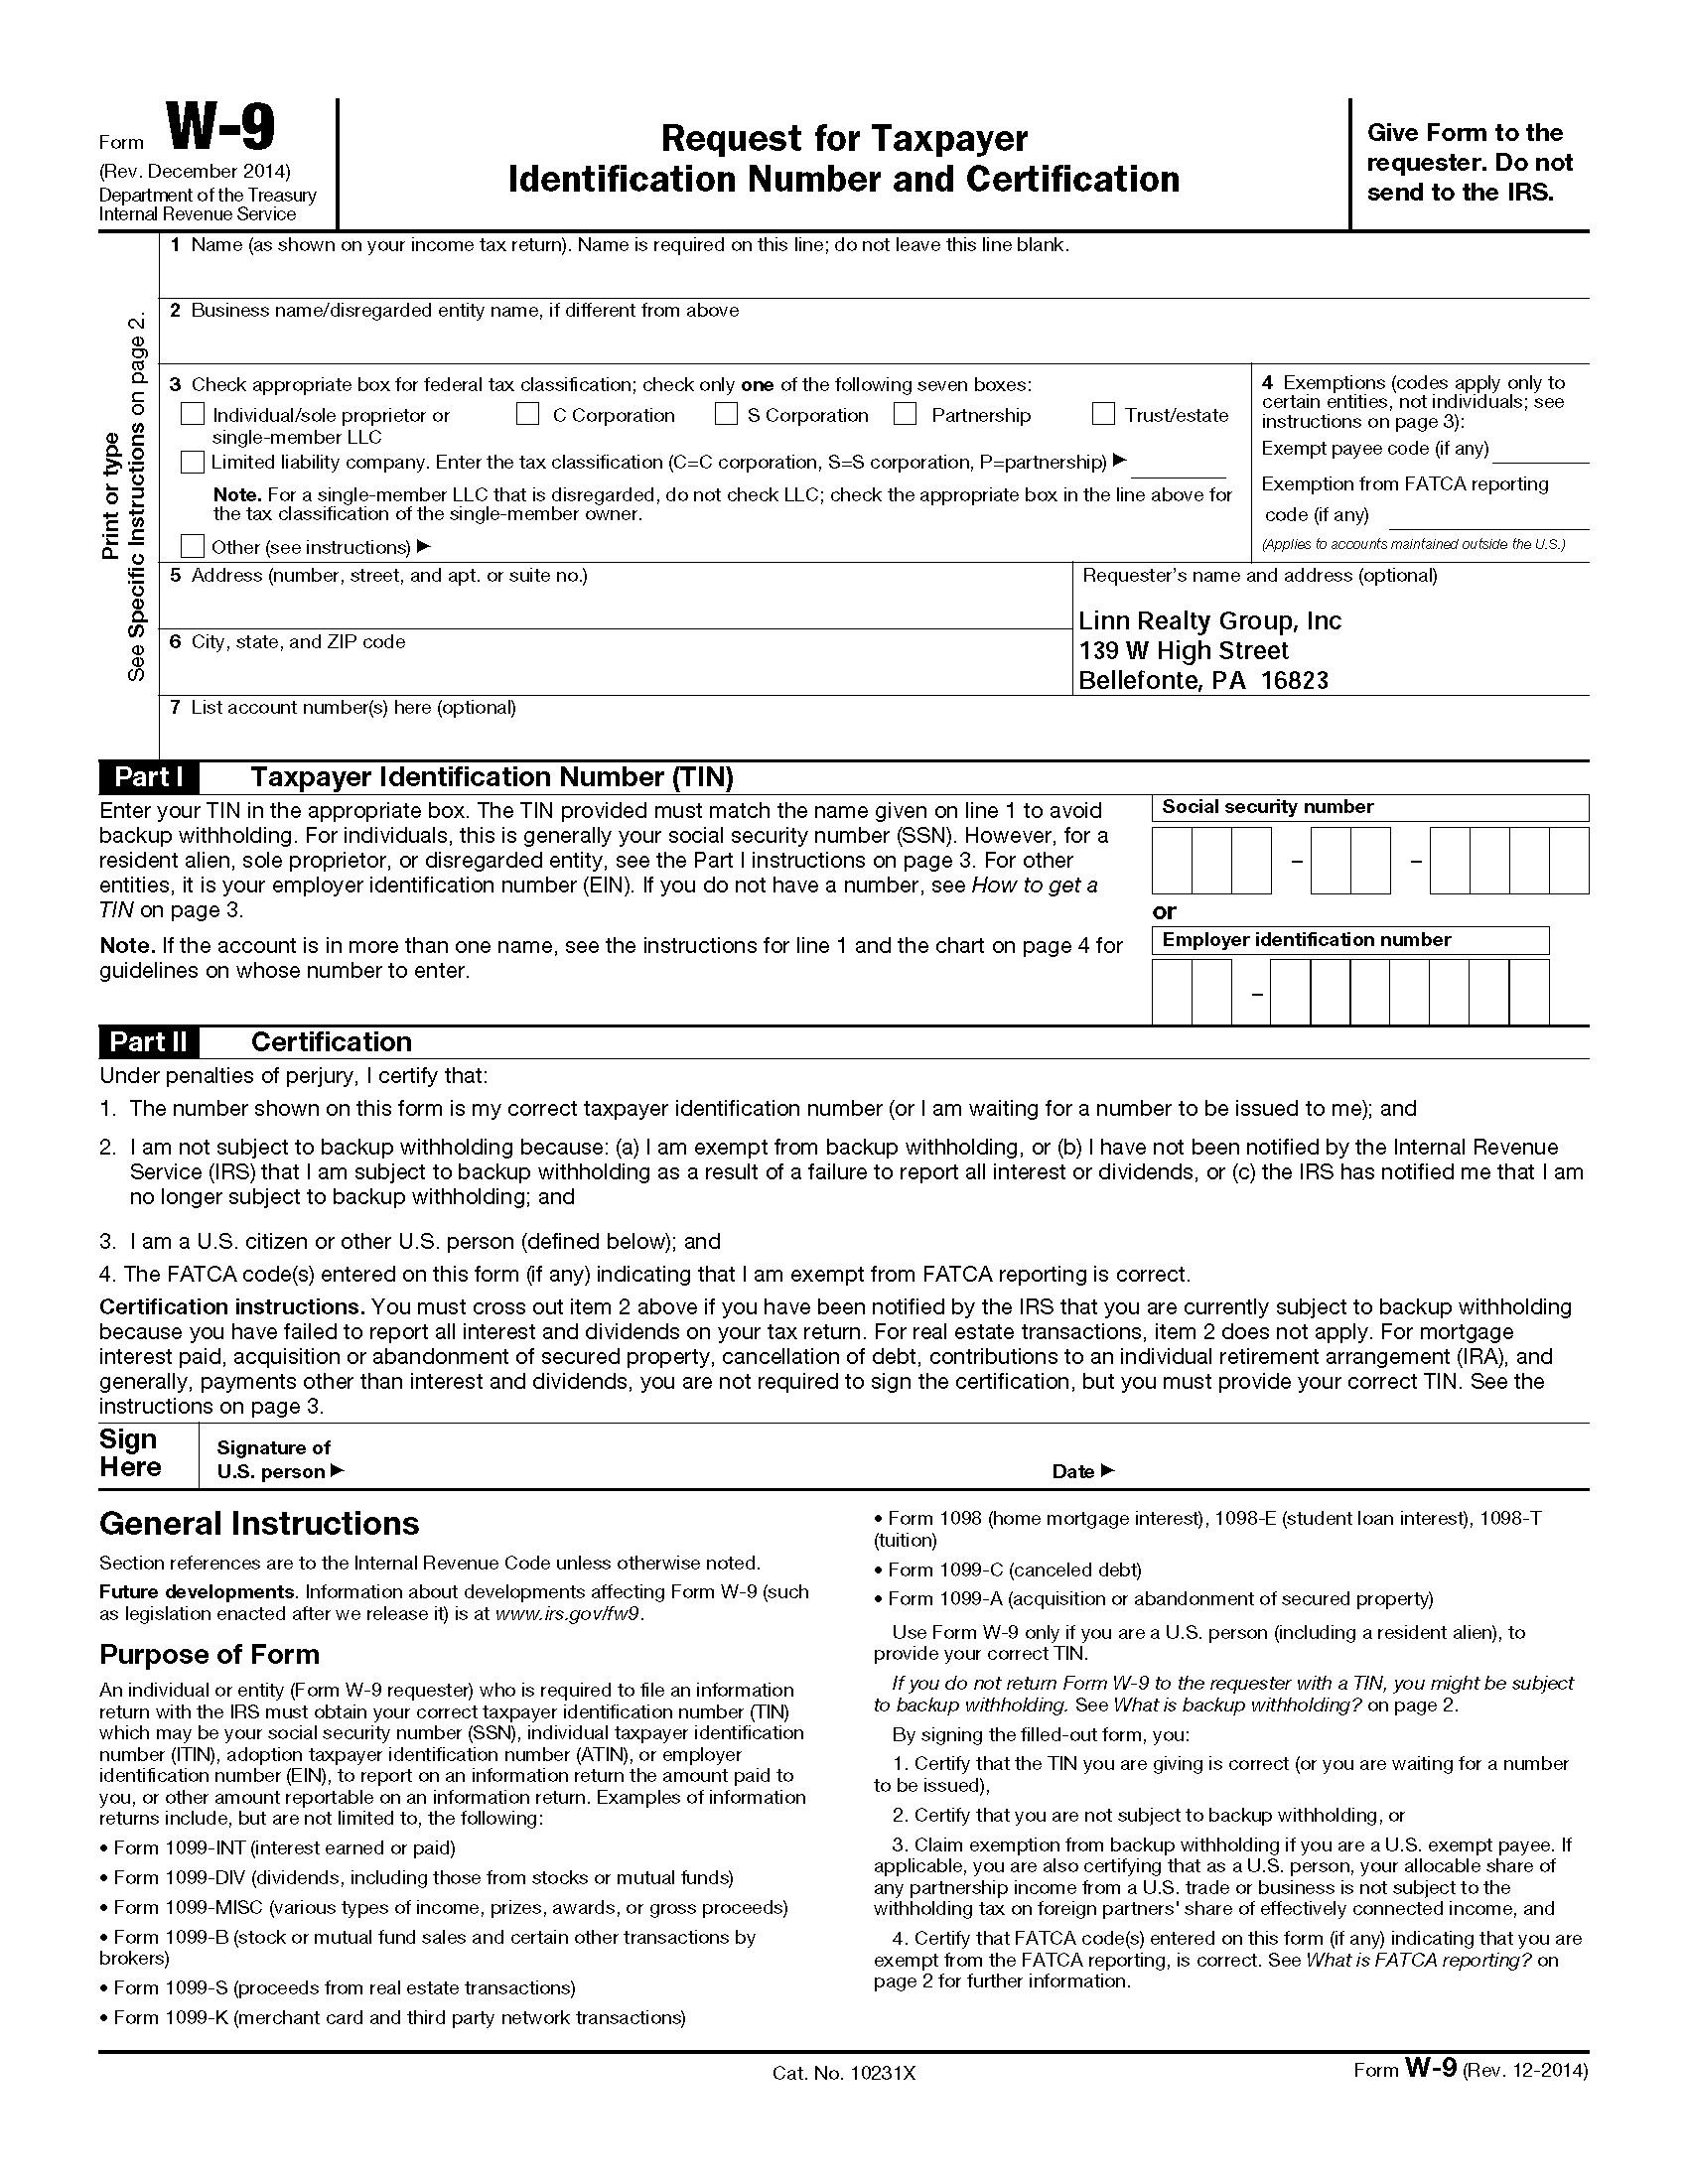 Blank 2019 W 9 Form Printable | Calendar Template Printable-W9 Forms 2020 Blank